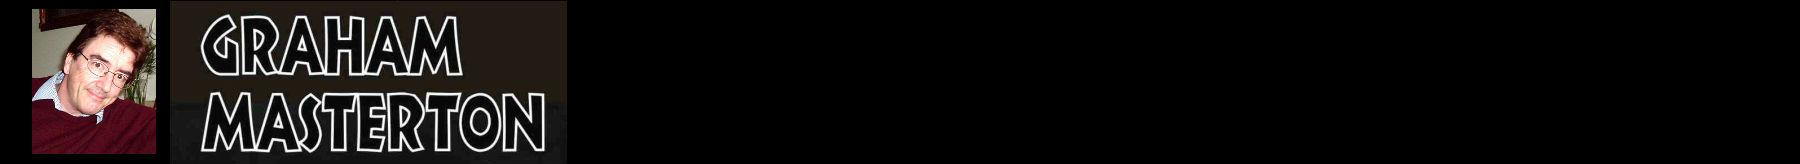 graham-masterton-logo